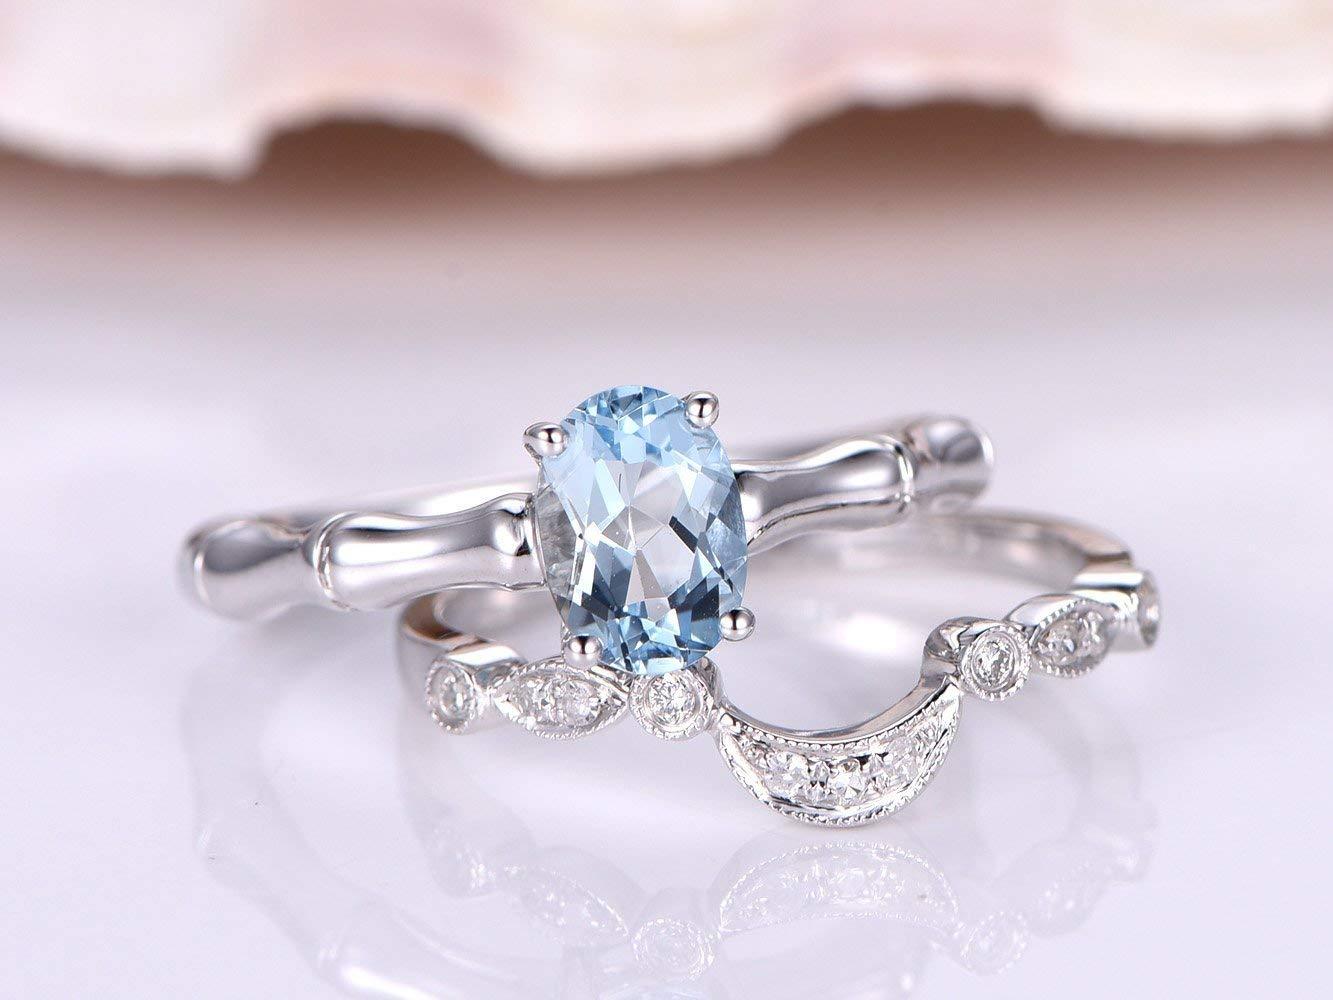 0.75 CT NATURAL AQUAMARINE MARQUISE CUT DIAMOND 14K ROSE GOLD Fn WEDDING RING